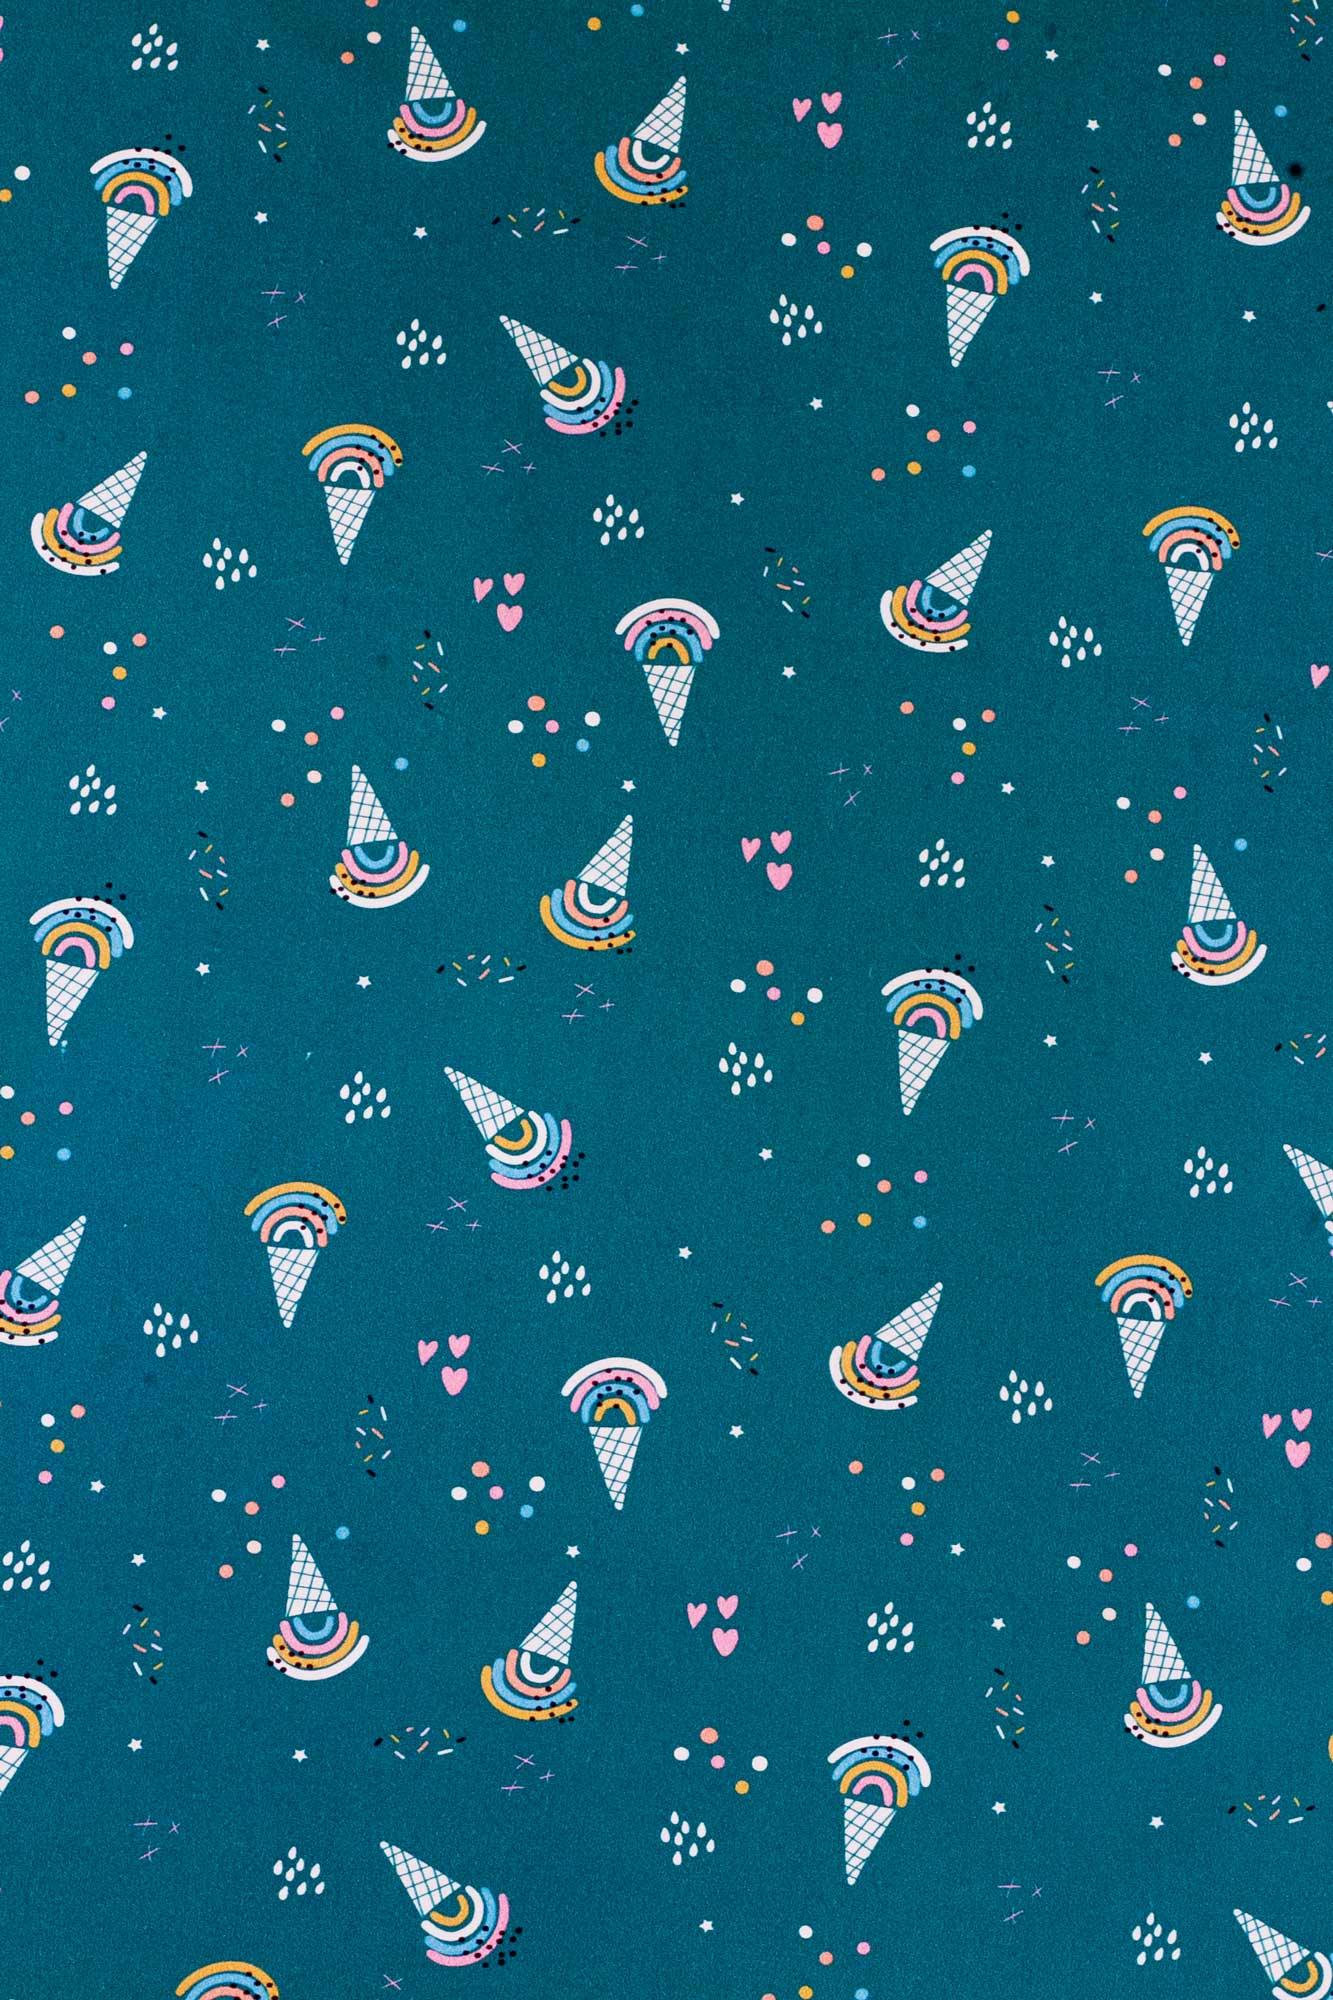 Lençol de cobrir mini cama Sorvete Colorê